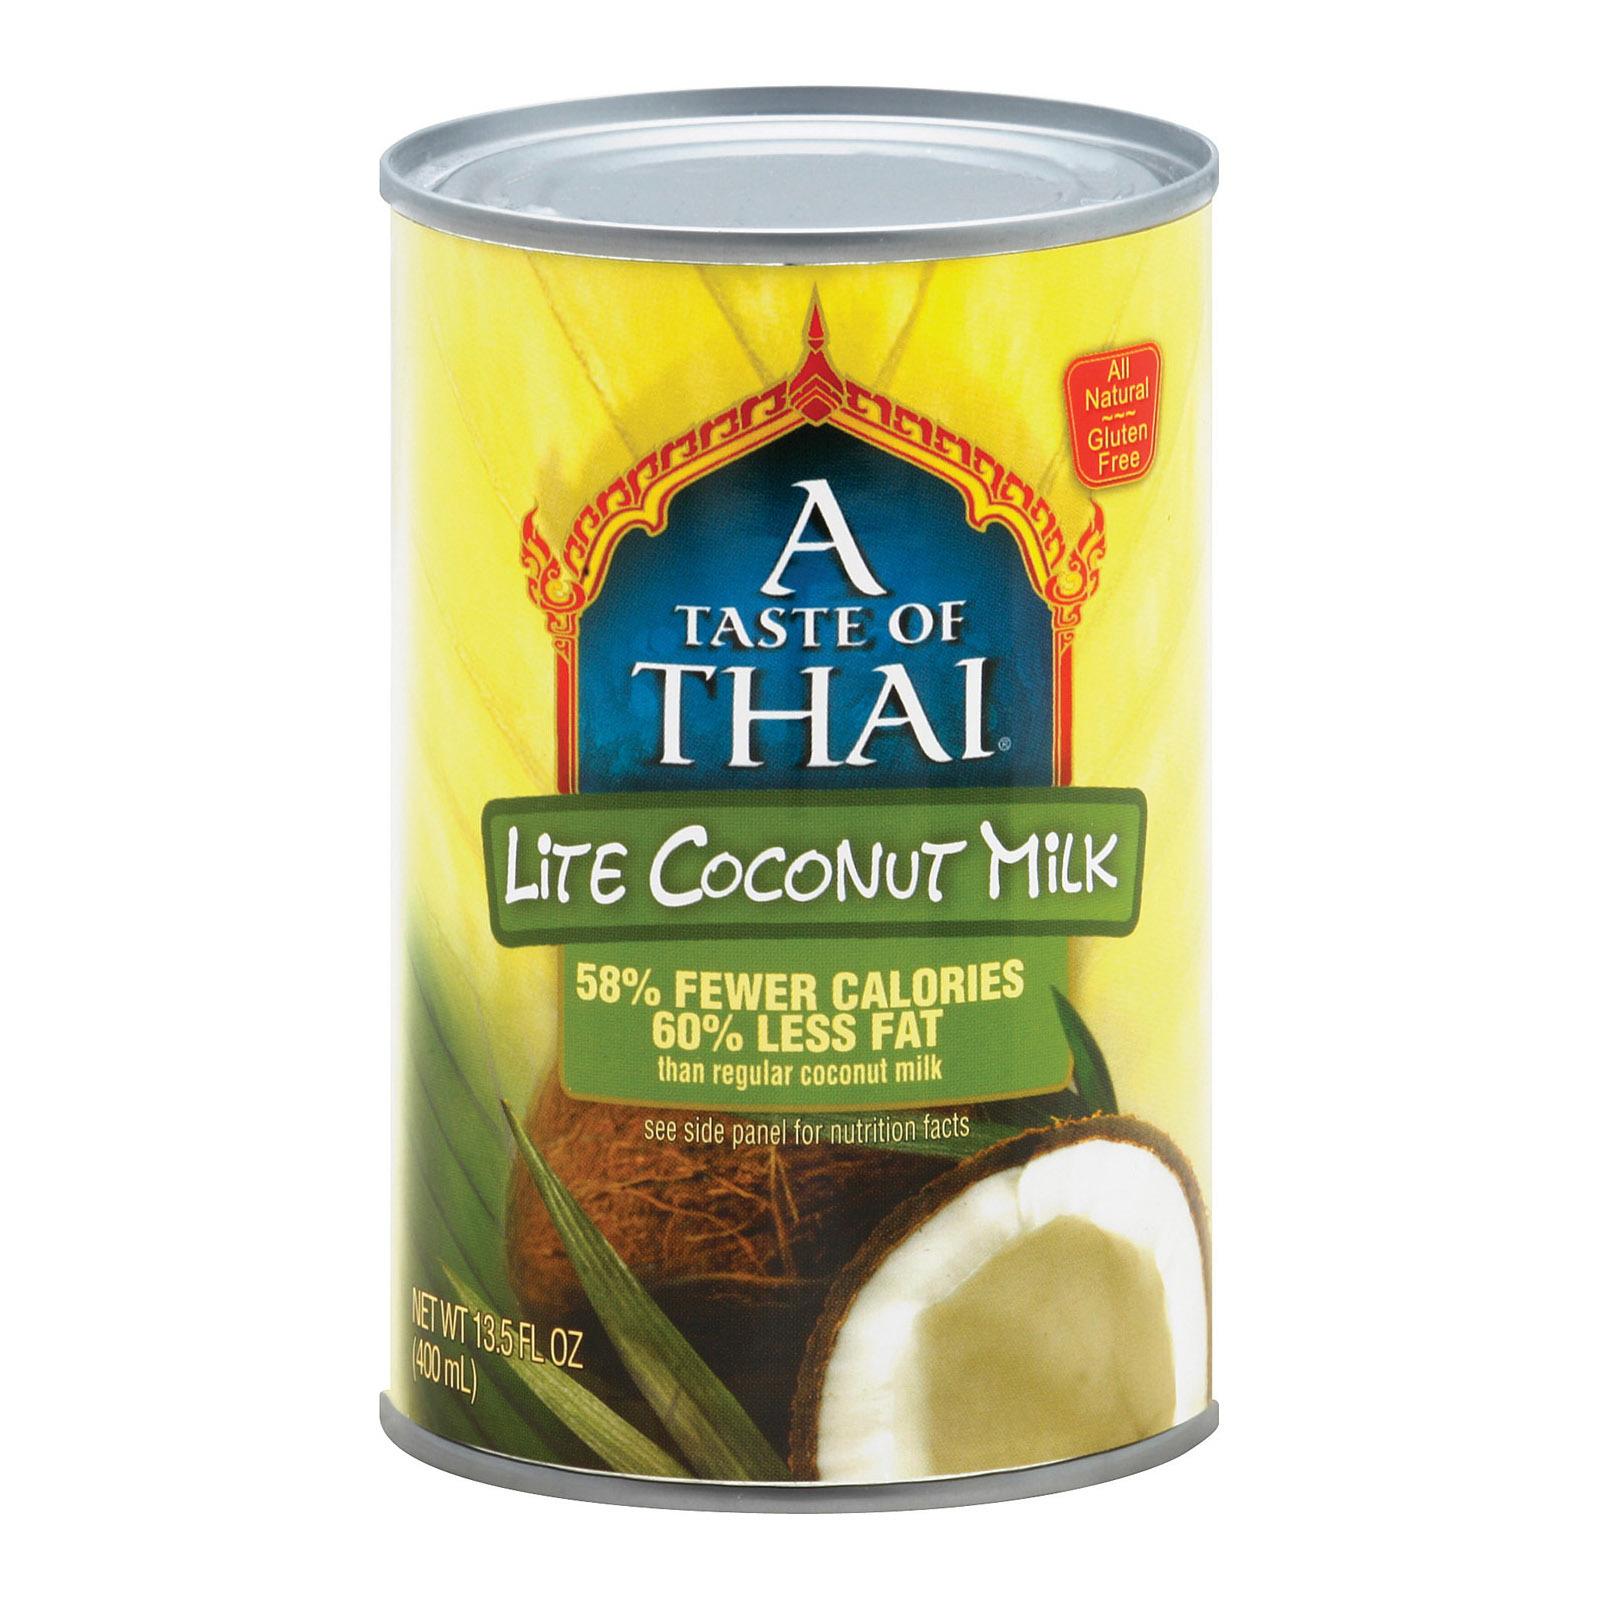 Taste of Thai Coconut Milk - Light - 13.5 Fl oz.